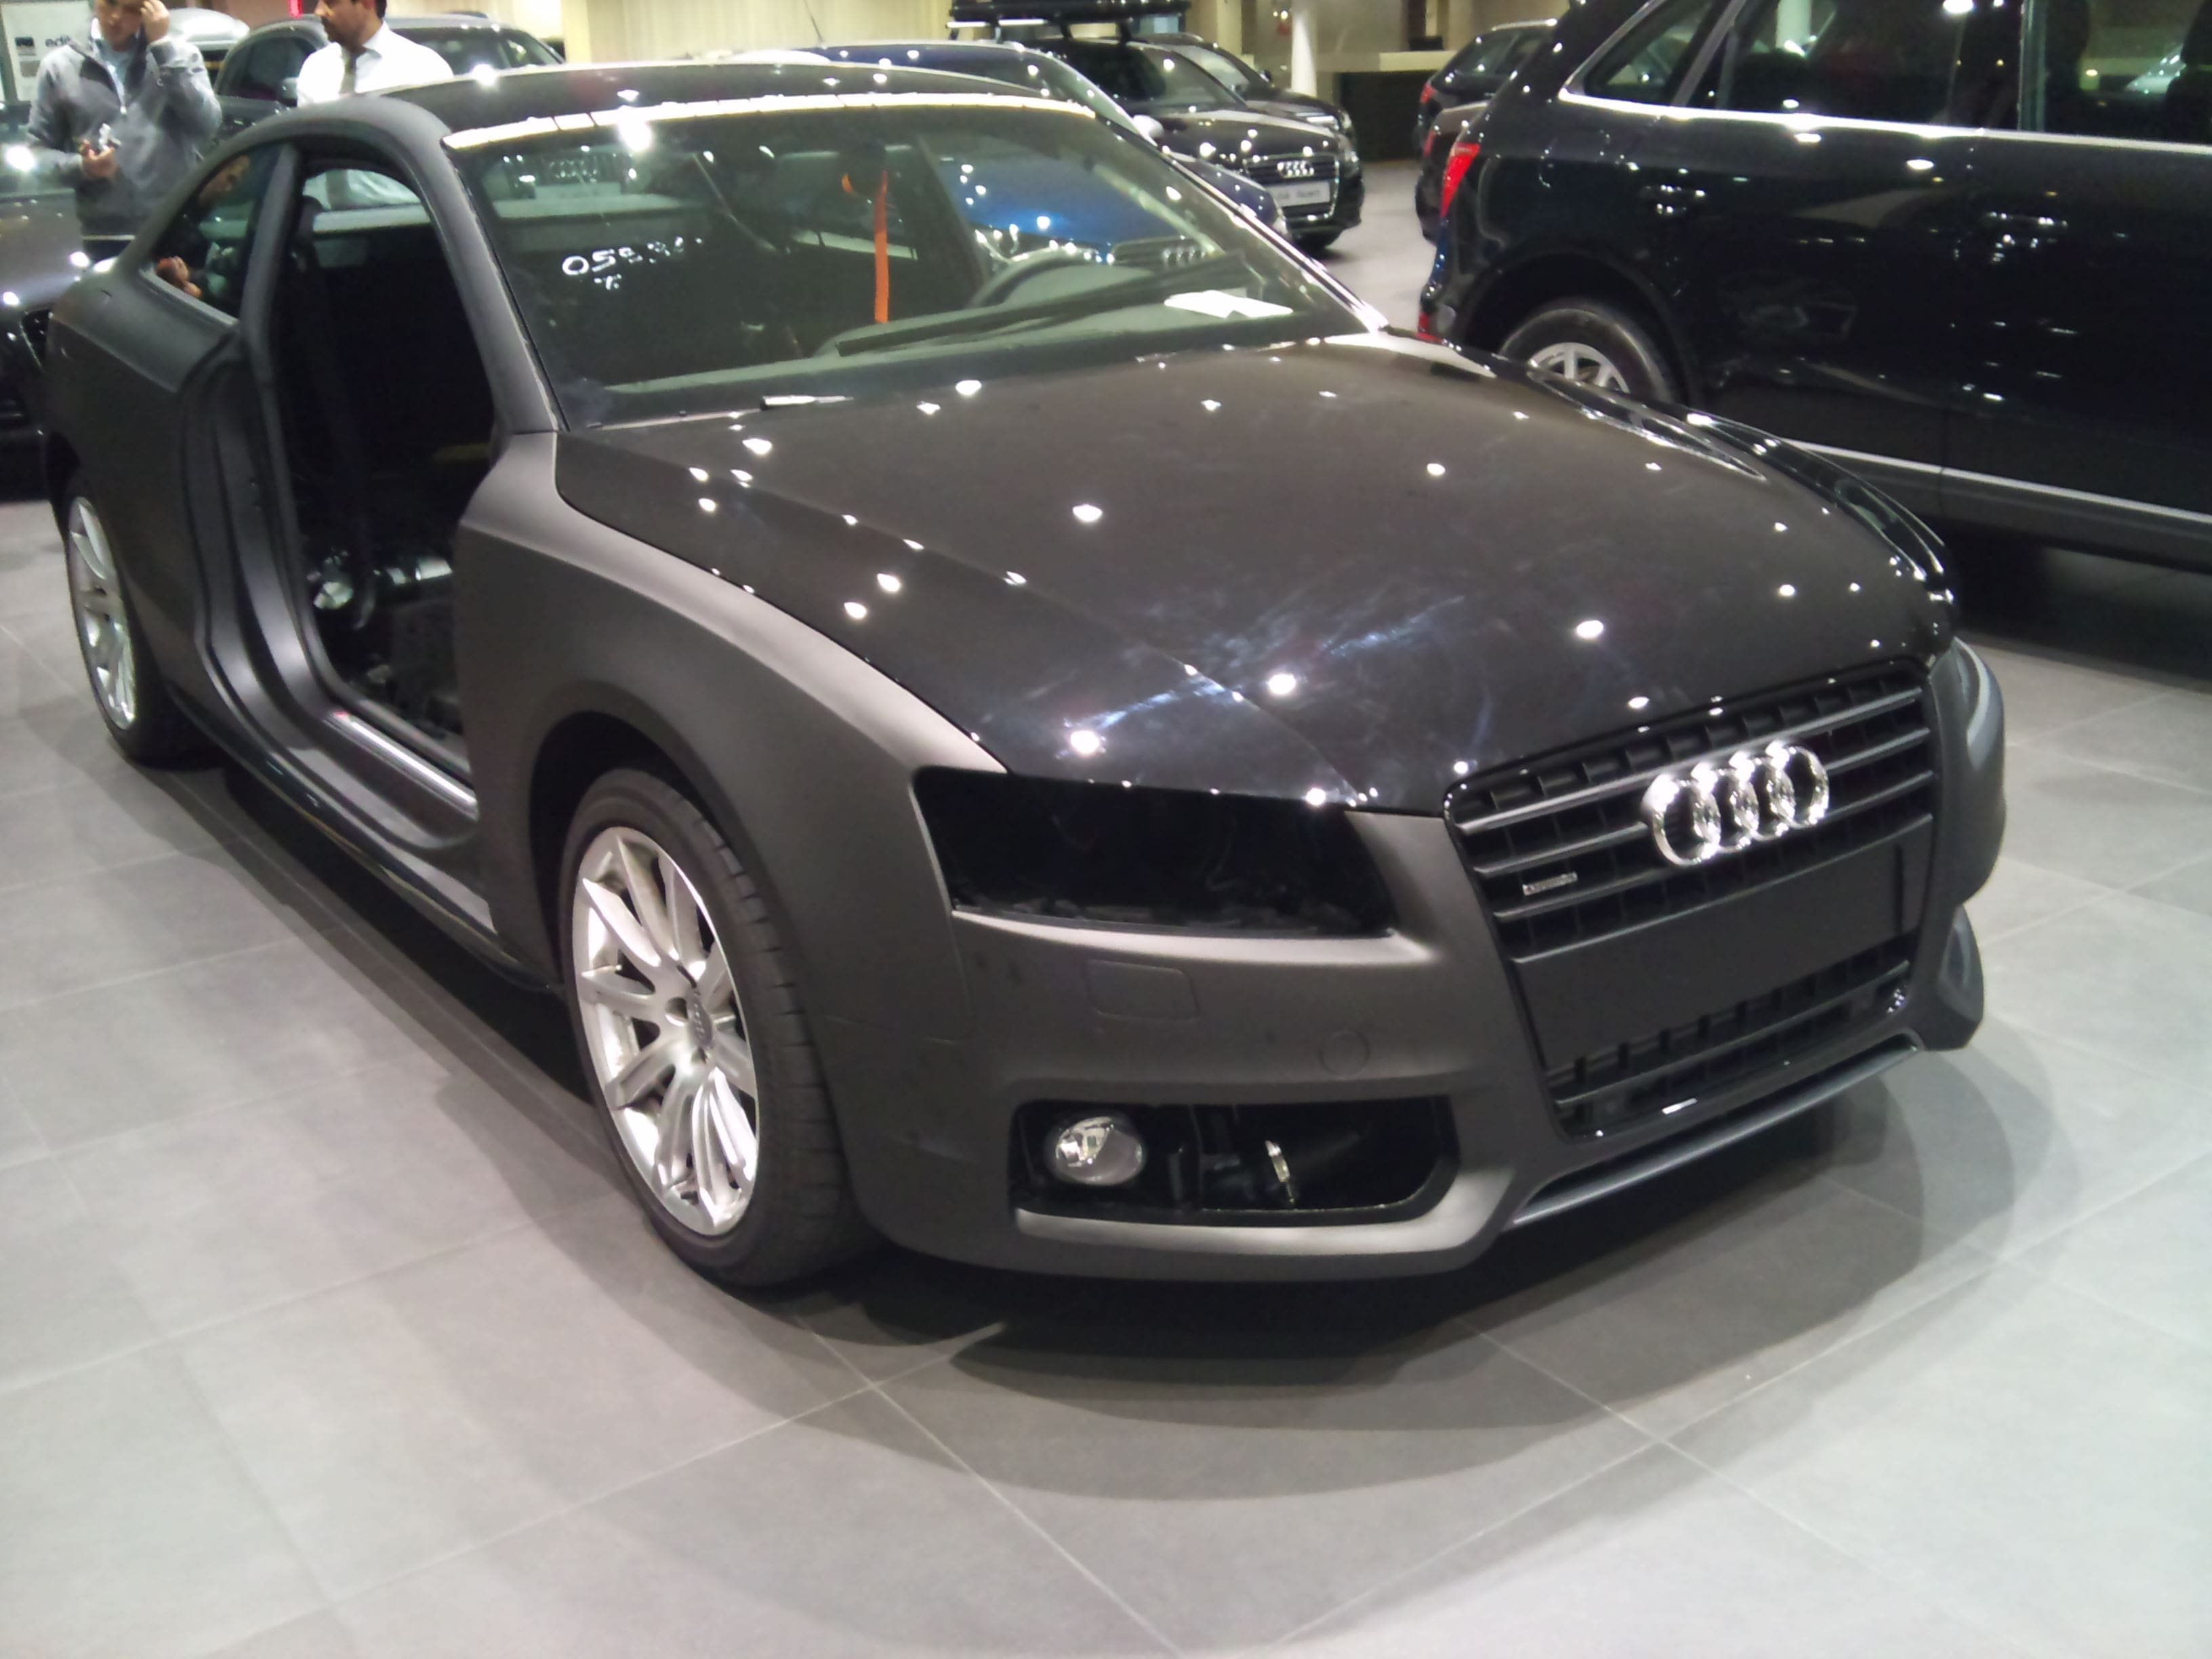 Audi A5 Coupe met Mat Zwarte Wrap, Carwrapping door Wrapmyride.nu Foto-nr:4557, ©2021